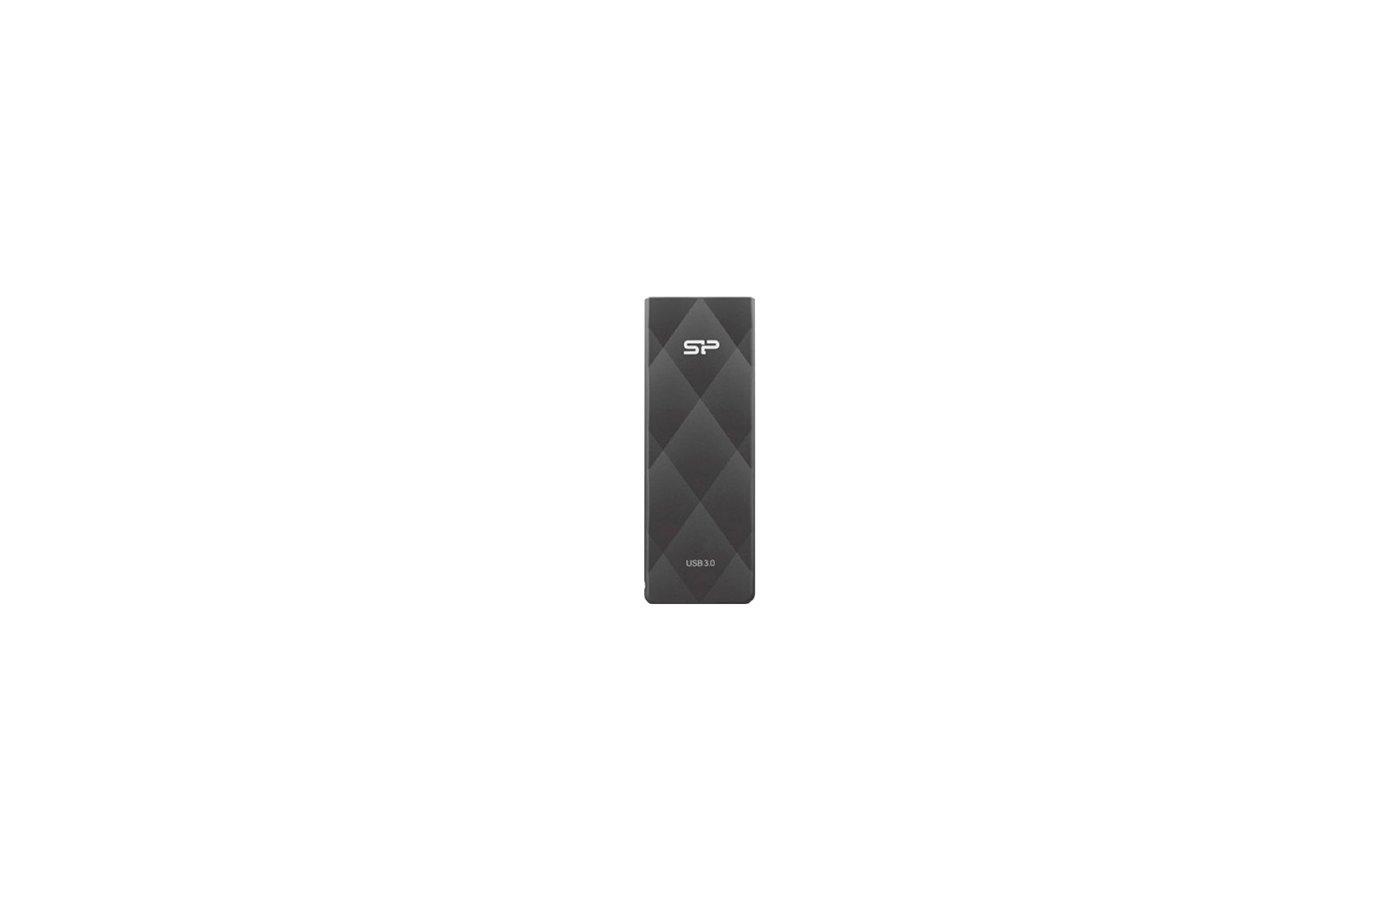 Флеш-диск USB 3.0 8GB Silicon Power Blaze B20 Black